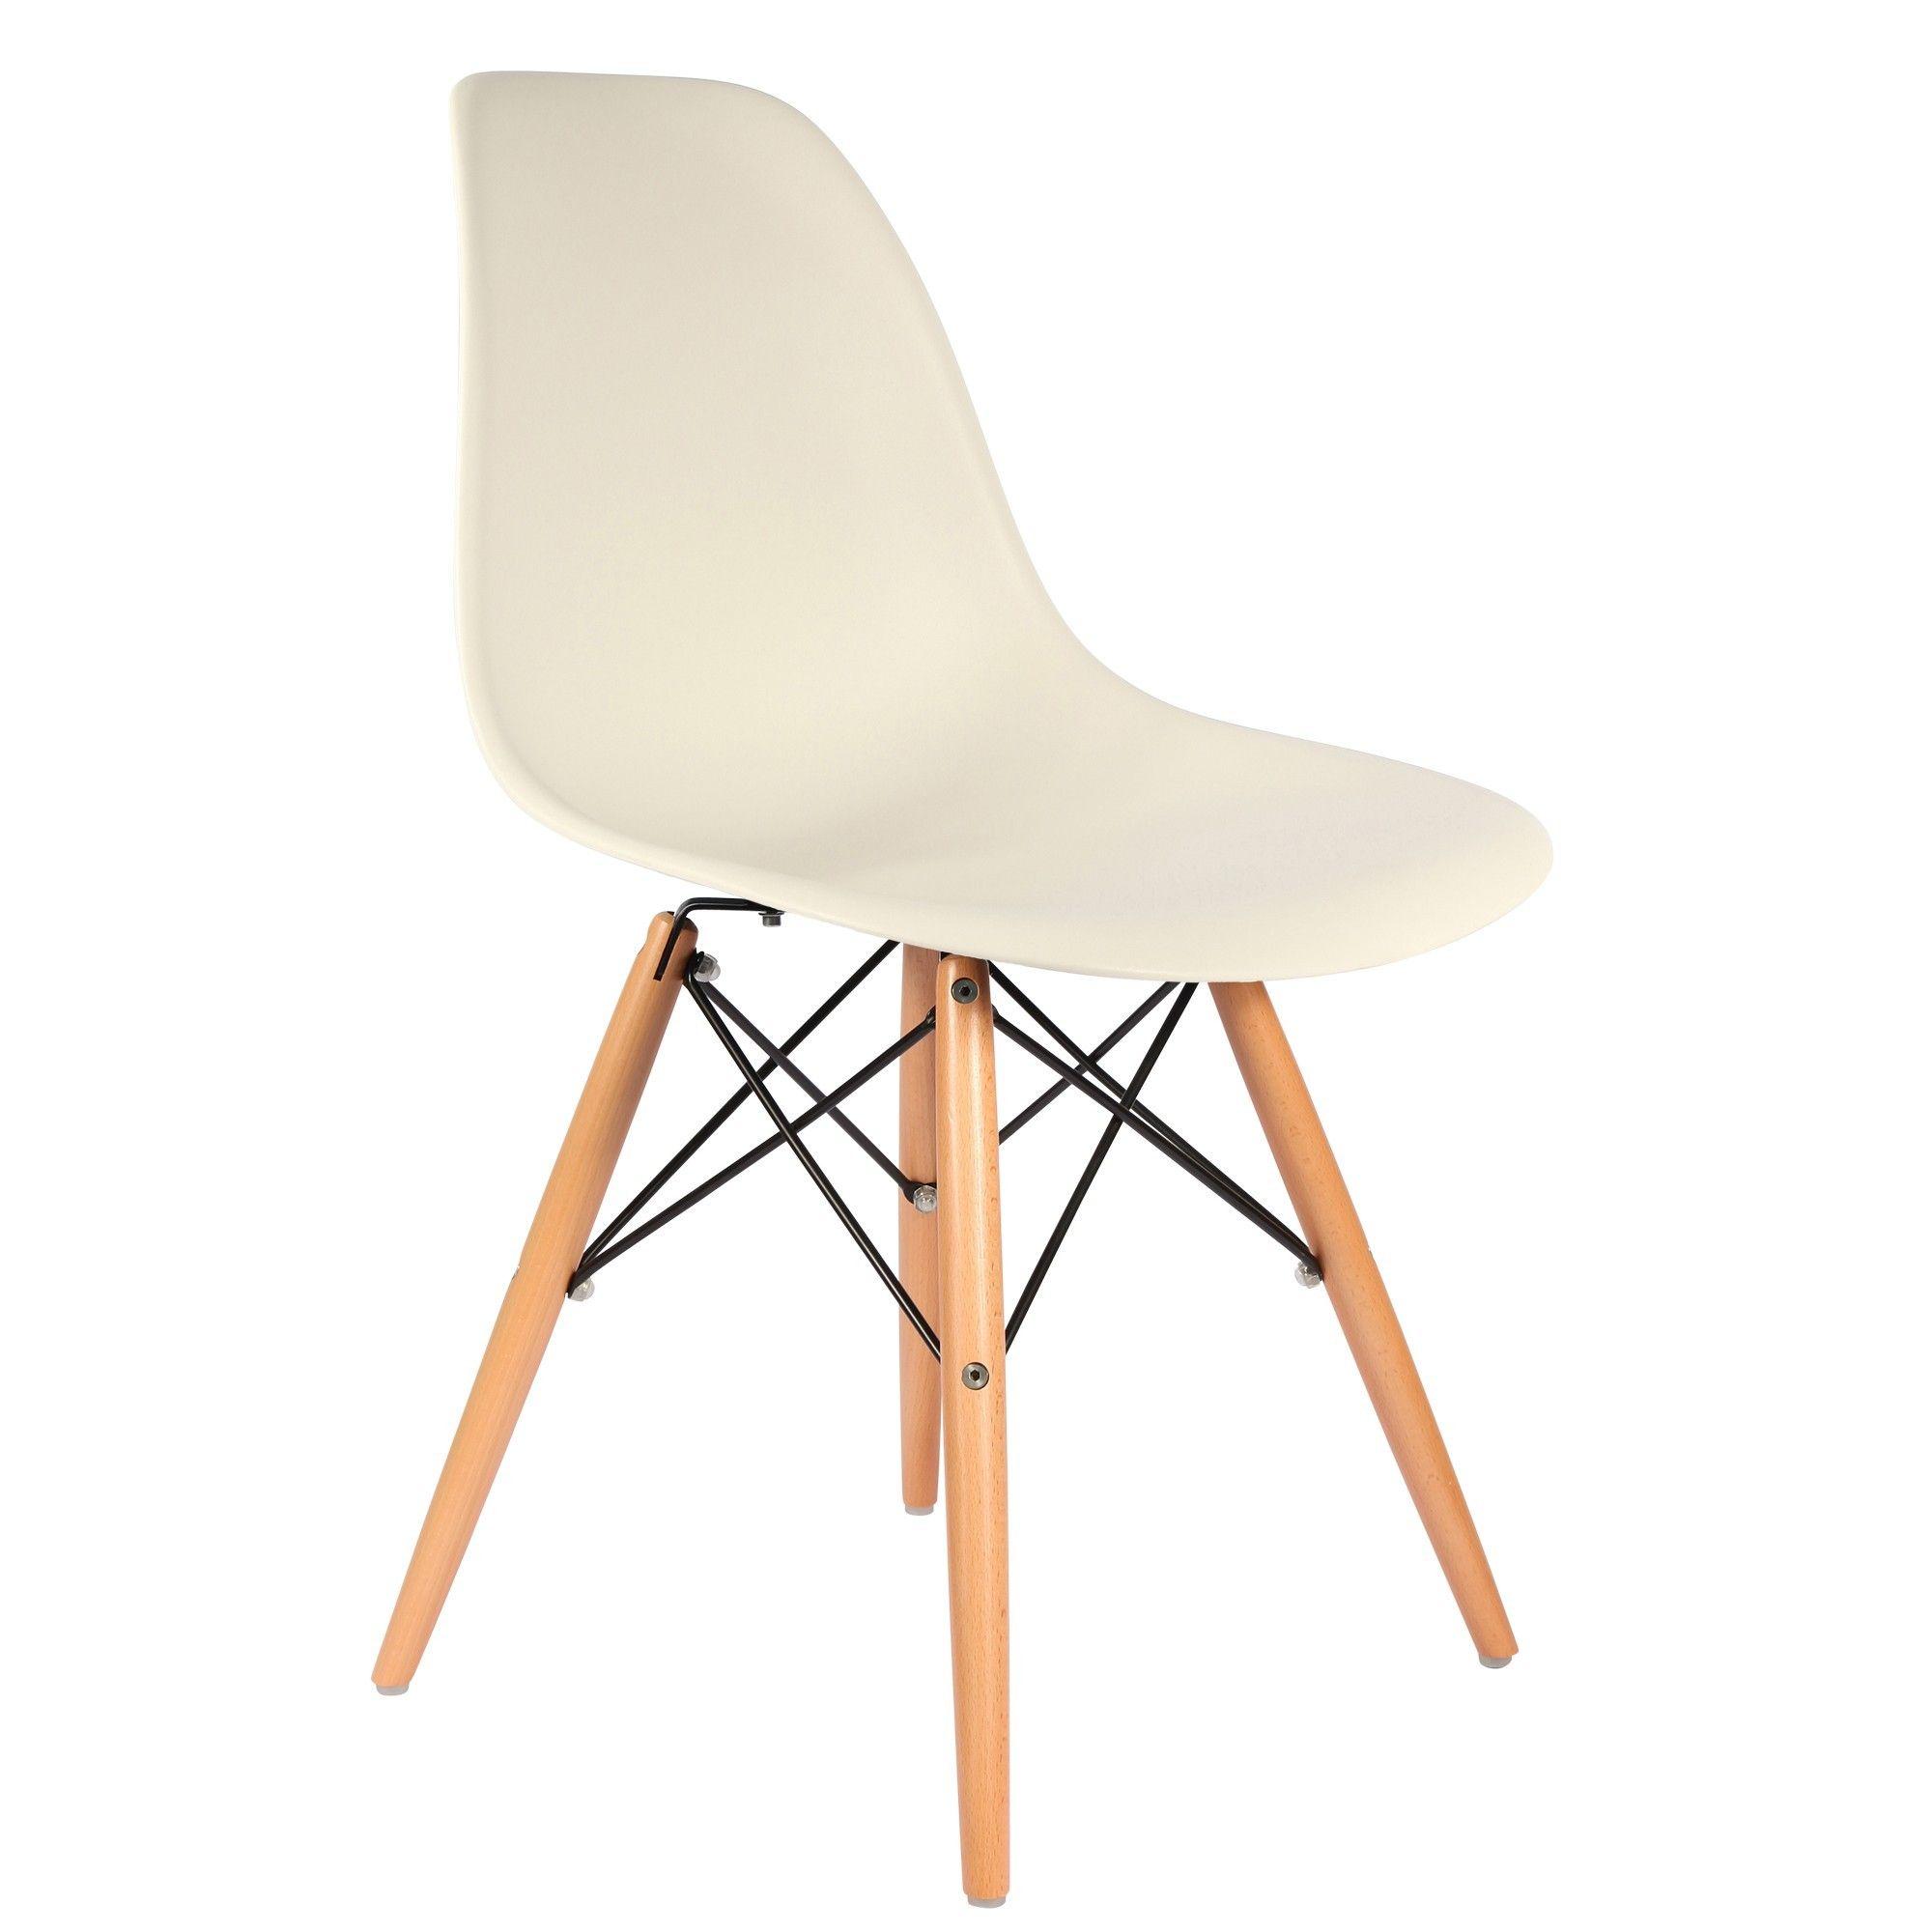 Chaise Design Dsw Chaise Dsw Eames Et Chaise Design